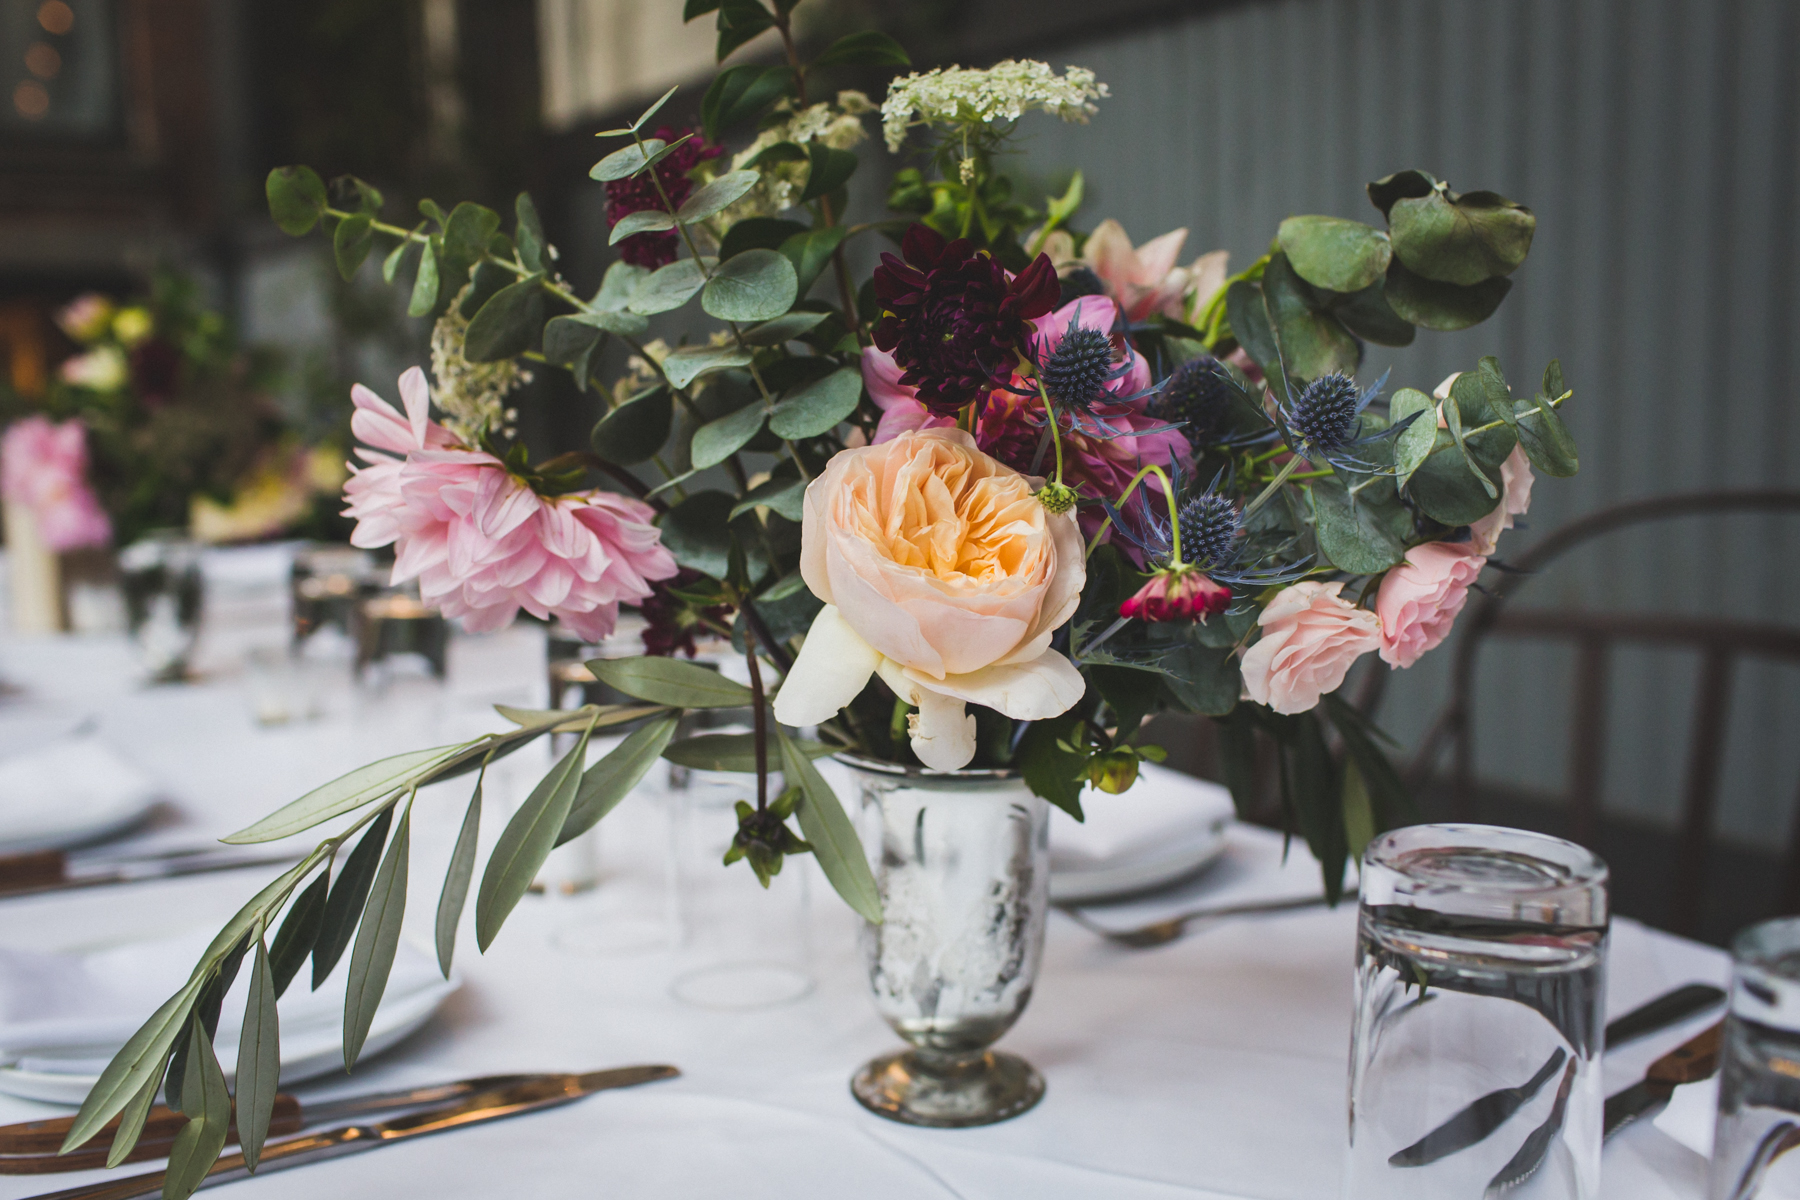 ICI-Restaurant-Fort-Greene-Brooklyn-Intimate-Documentary-Wedding-Photography-Elvira-Kalviste-62.jpg